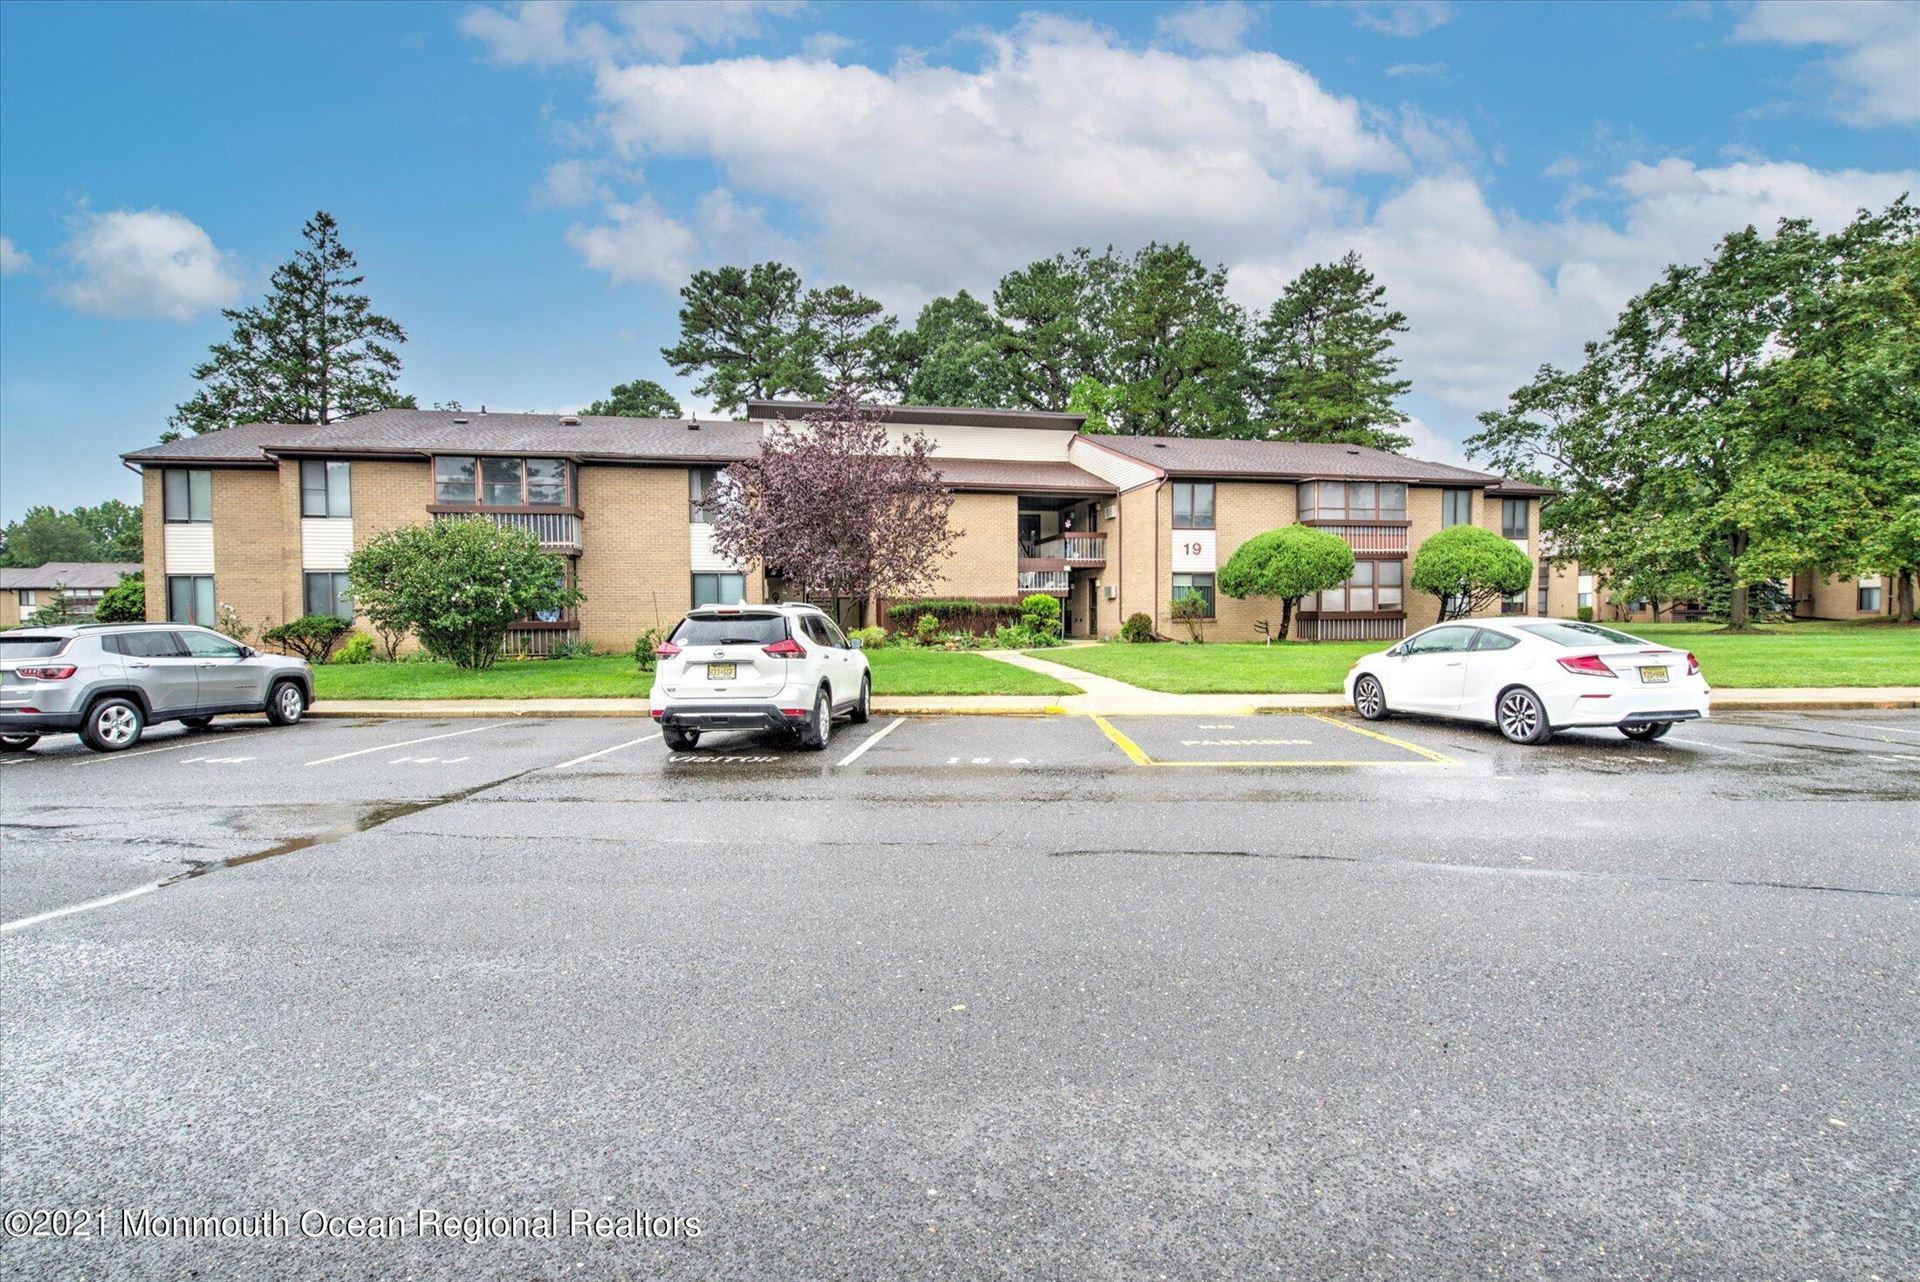 19 Pine Cluster Circle #J, Manalapan, NJ 07726 - MLS#: 22129941